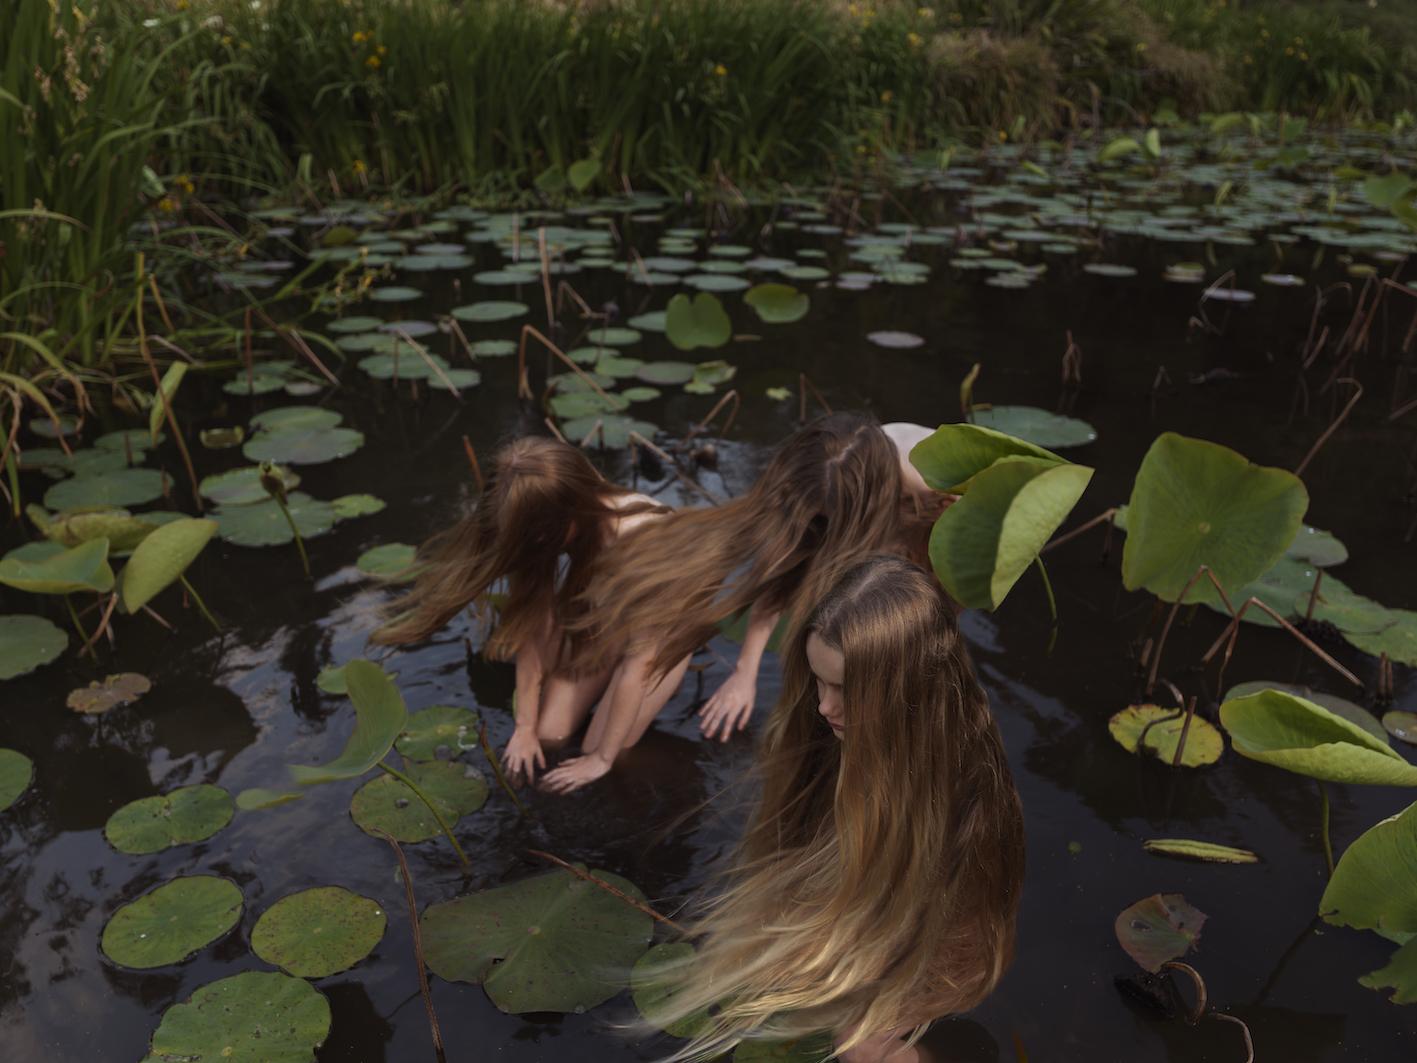 Sacred lotus (Nelumbo nucifera) in Sprin